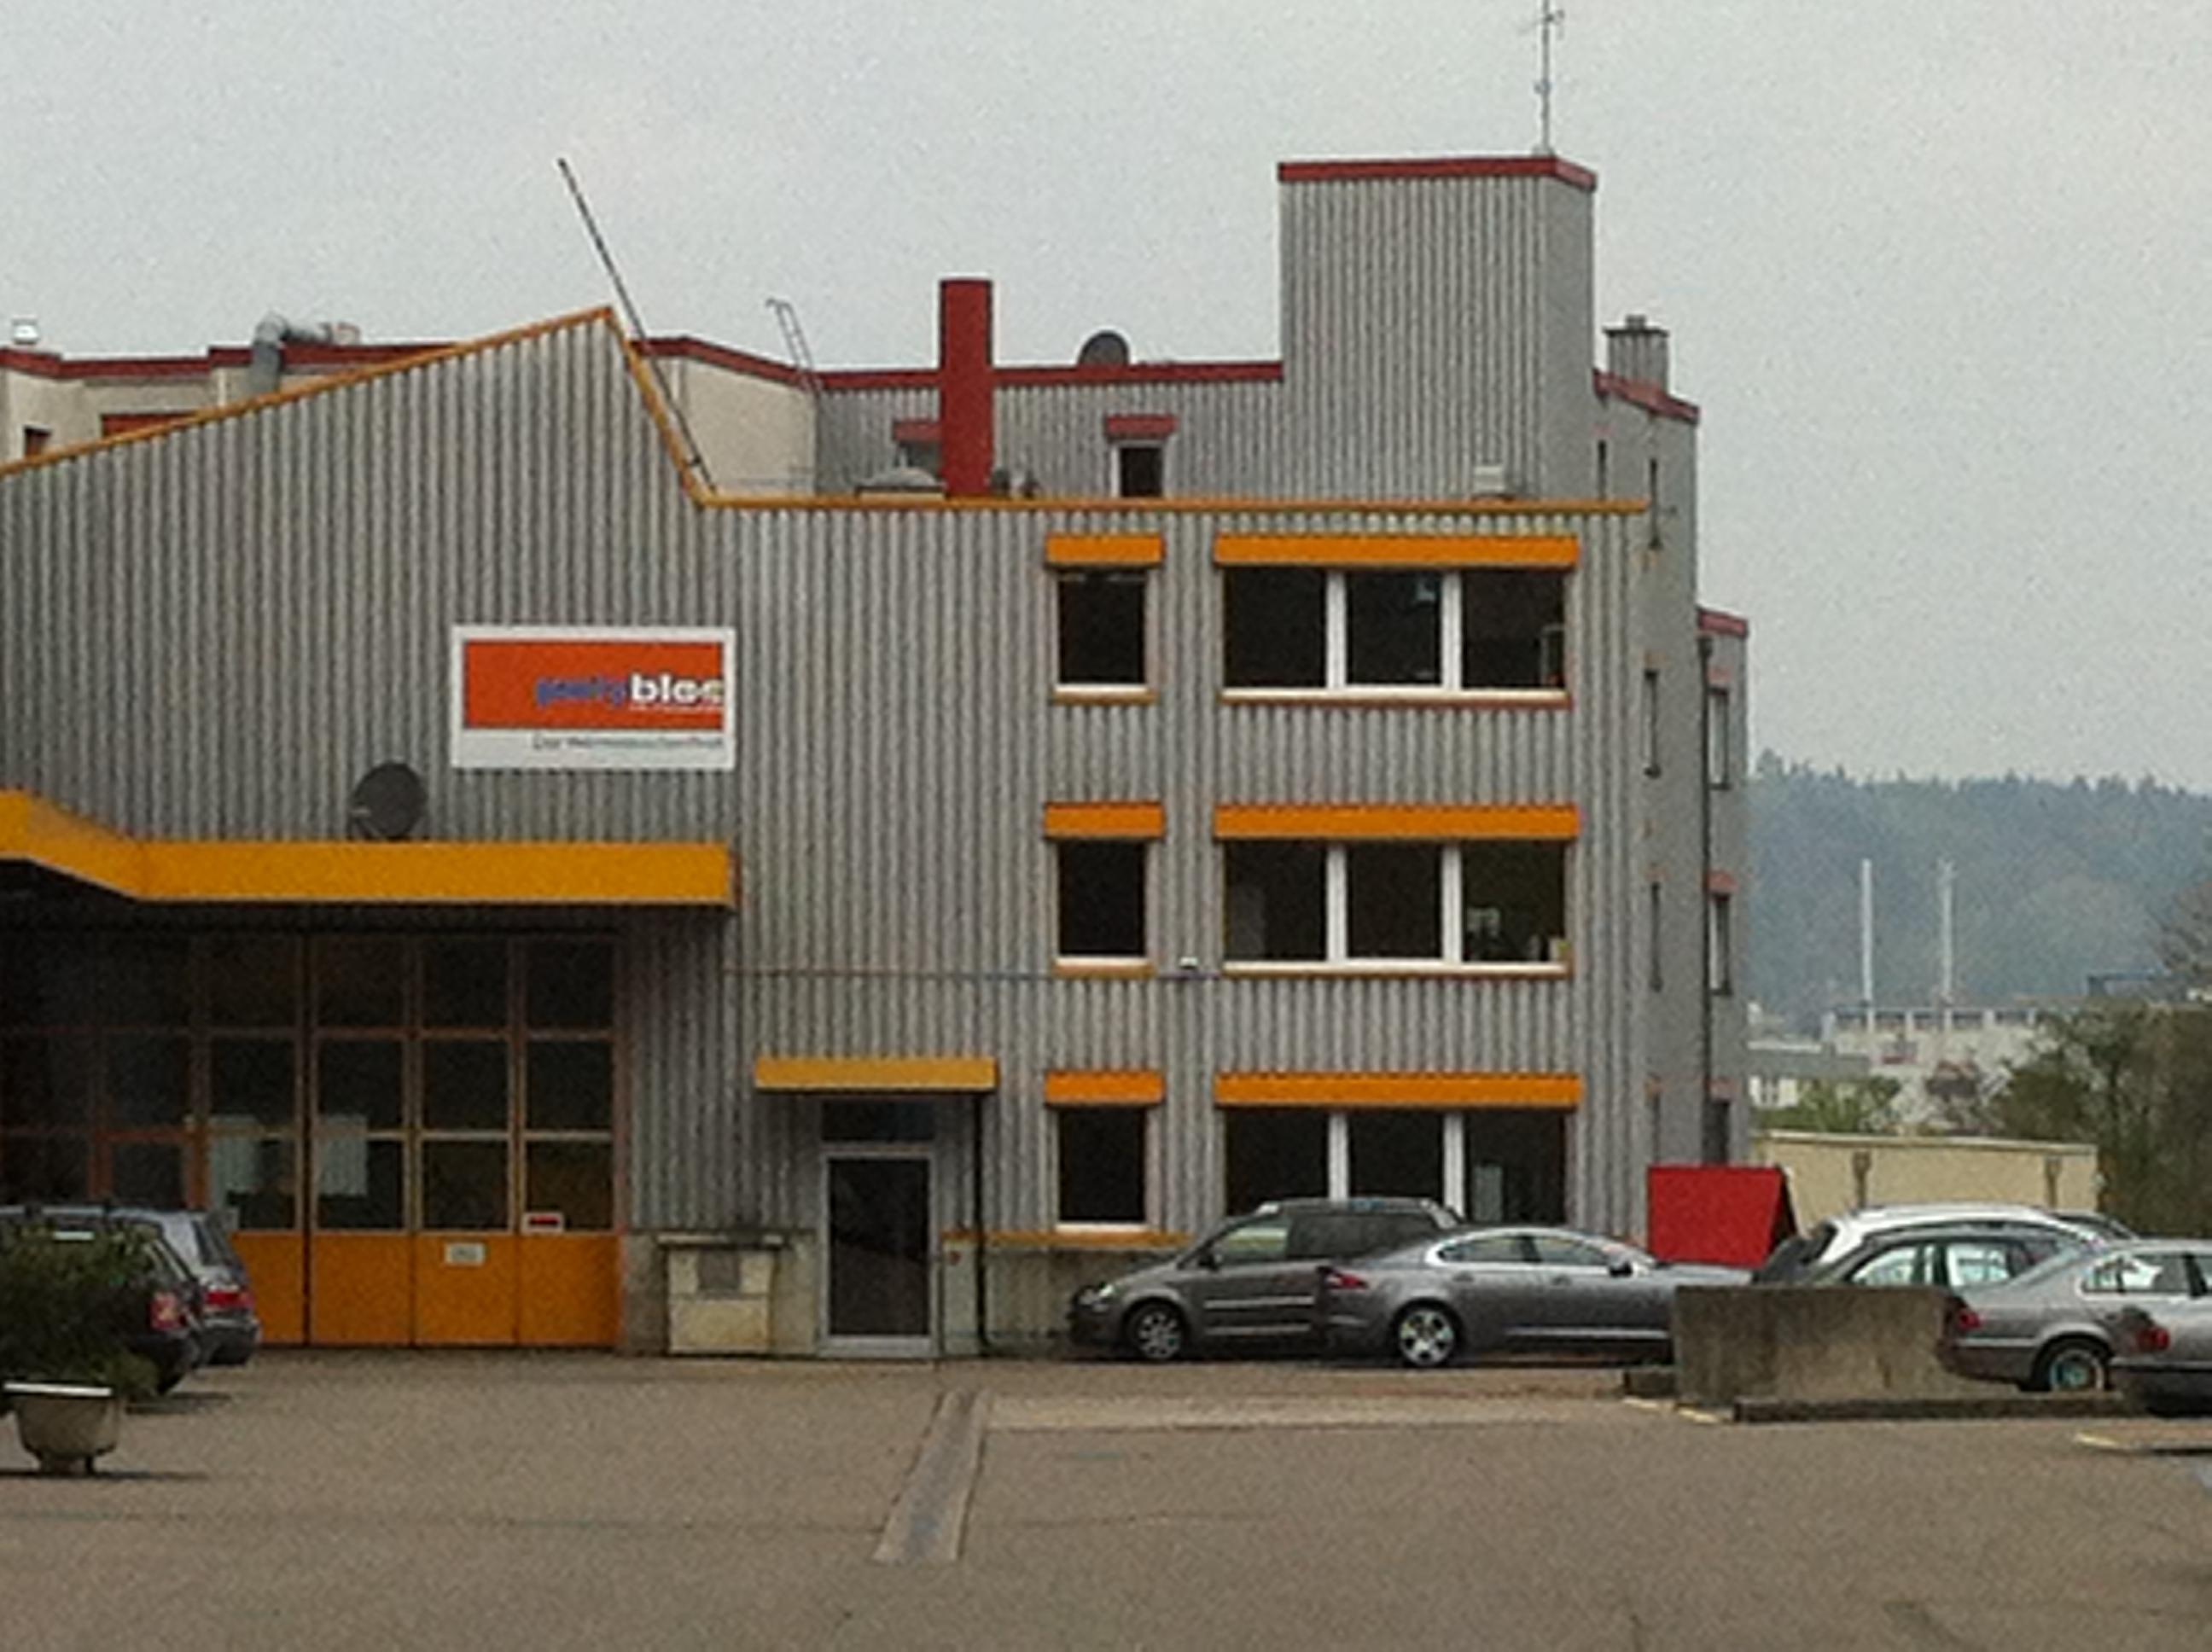 ABCD Fahrschule Verkehrkundekurse Winterthur